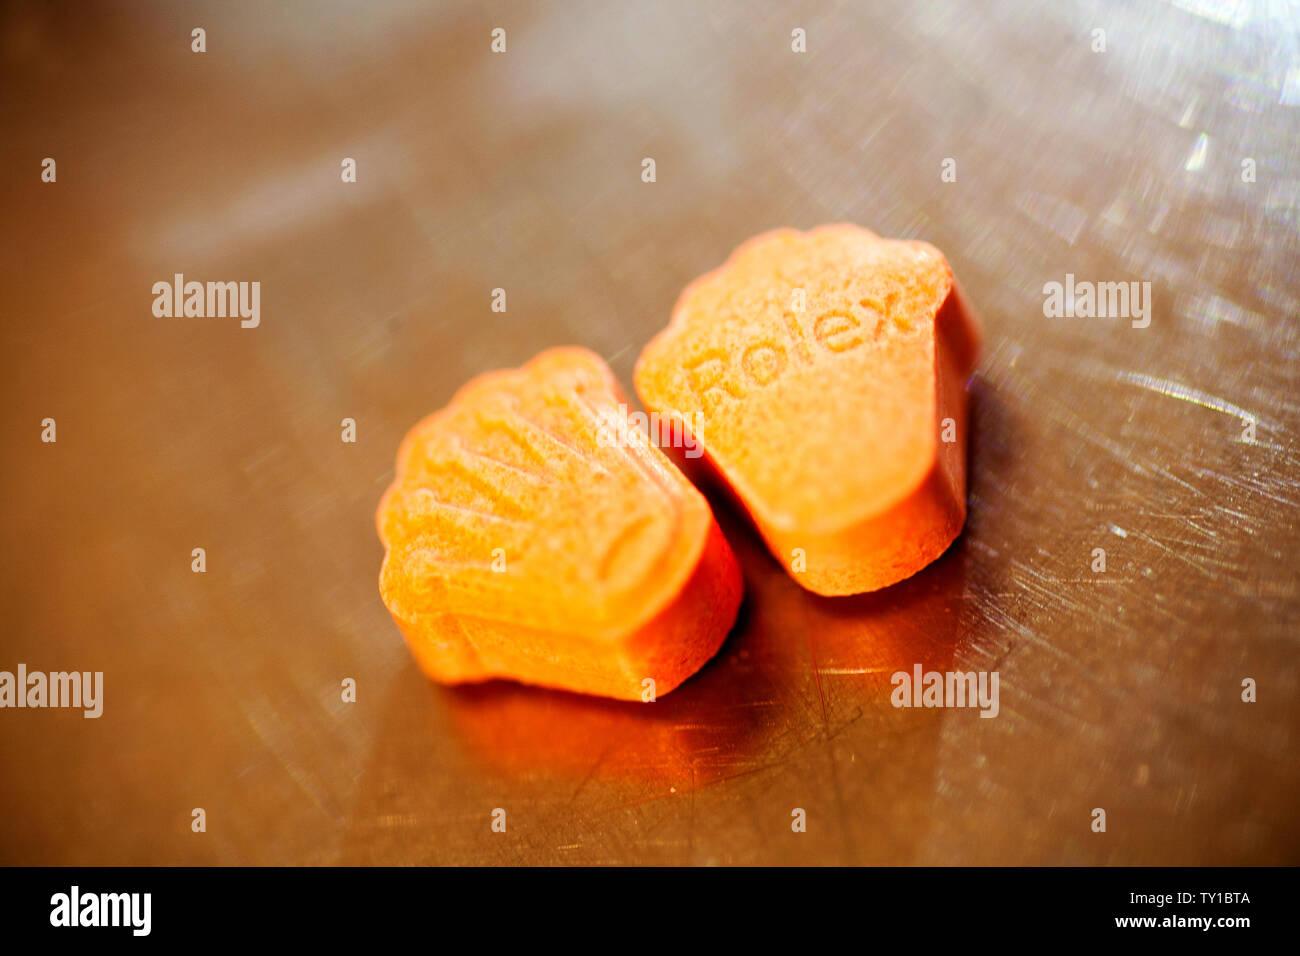 La MDMA Extasy macro fond fine art dans des impressions de haute qualité Banque D'Images